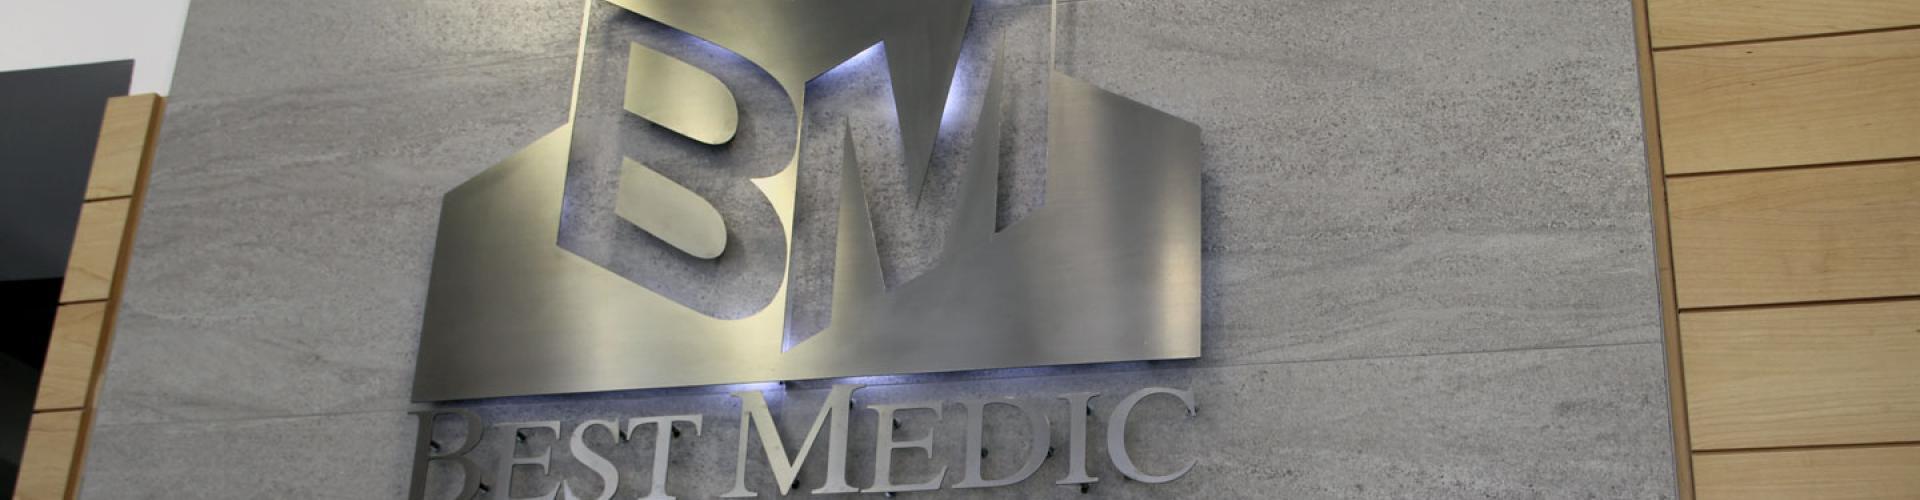 Oficinas Bestmedic